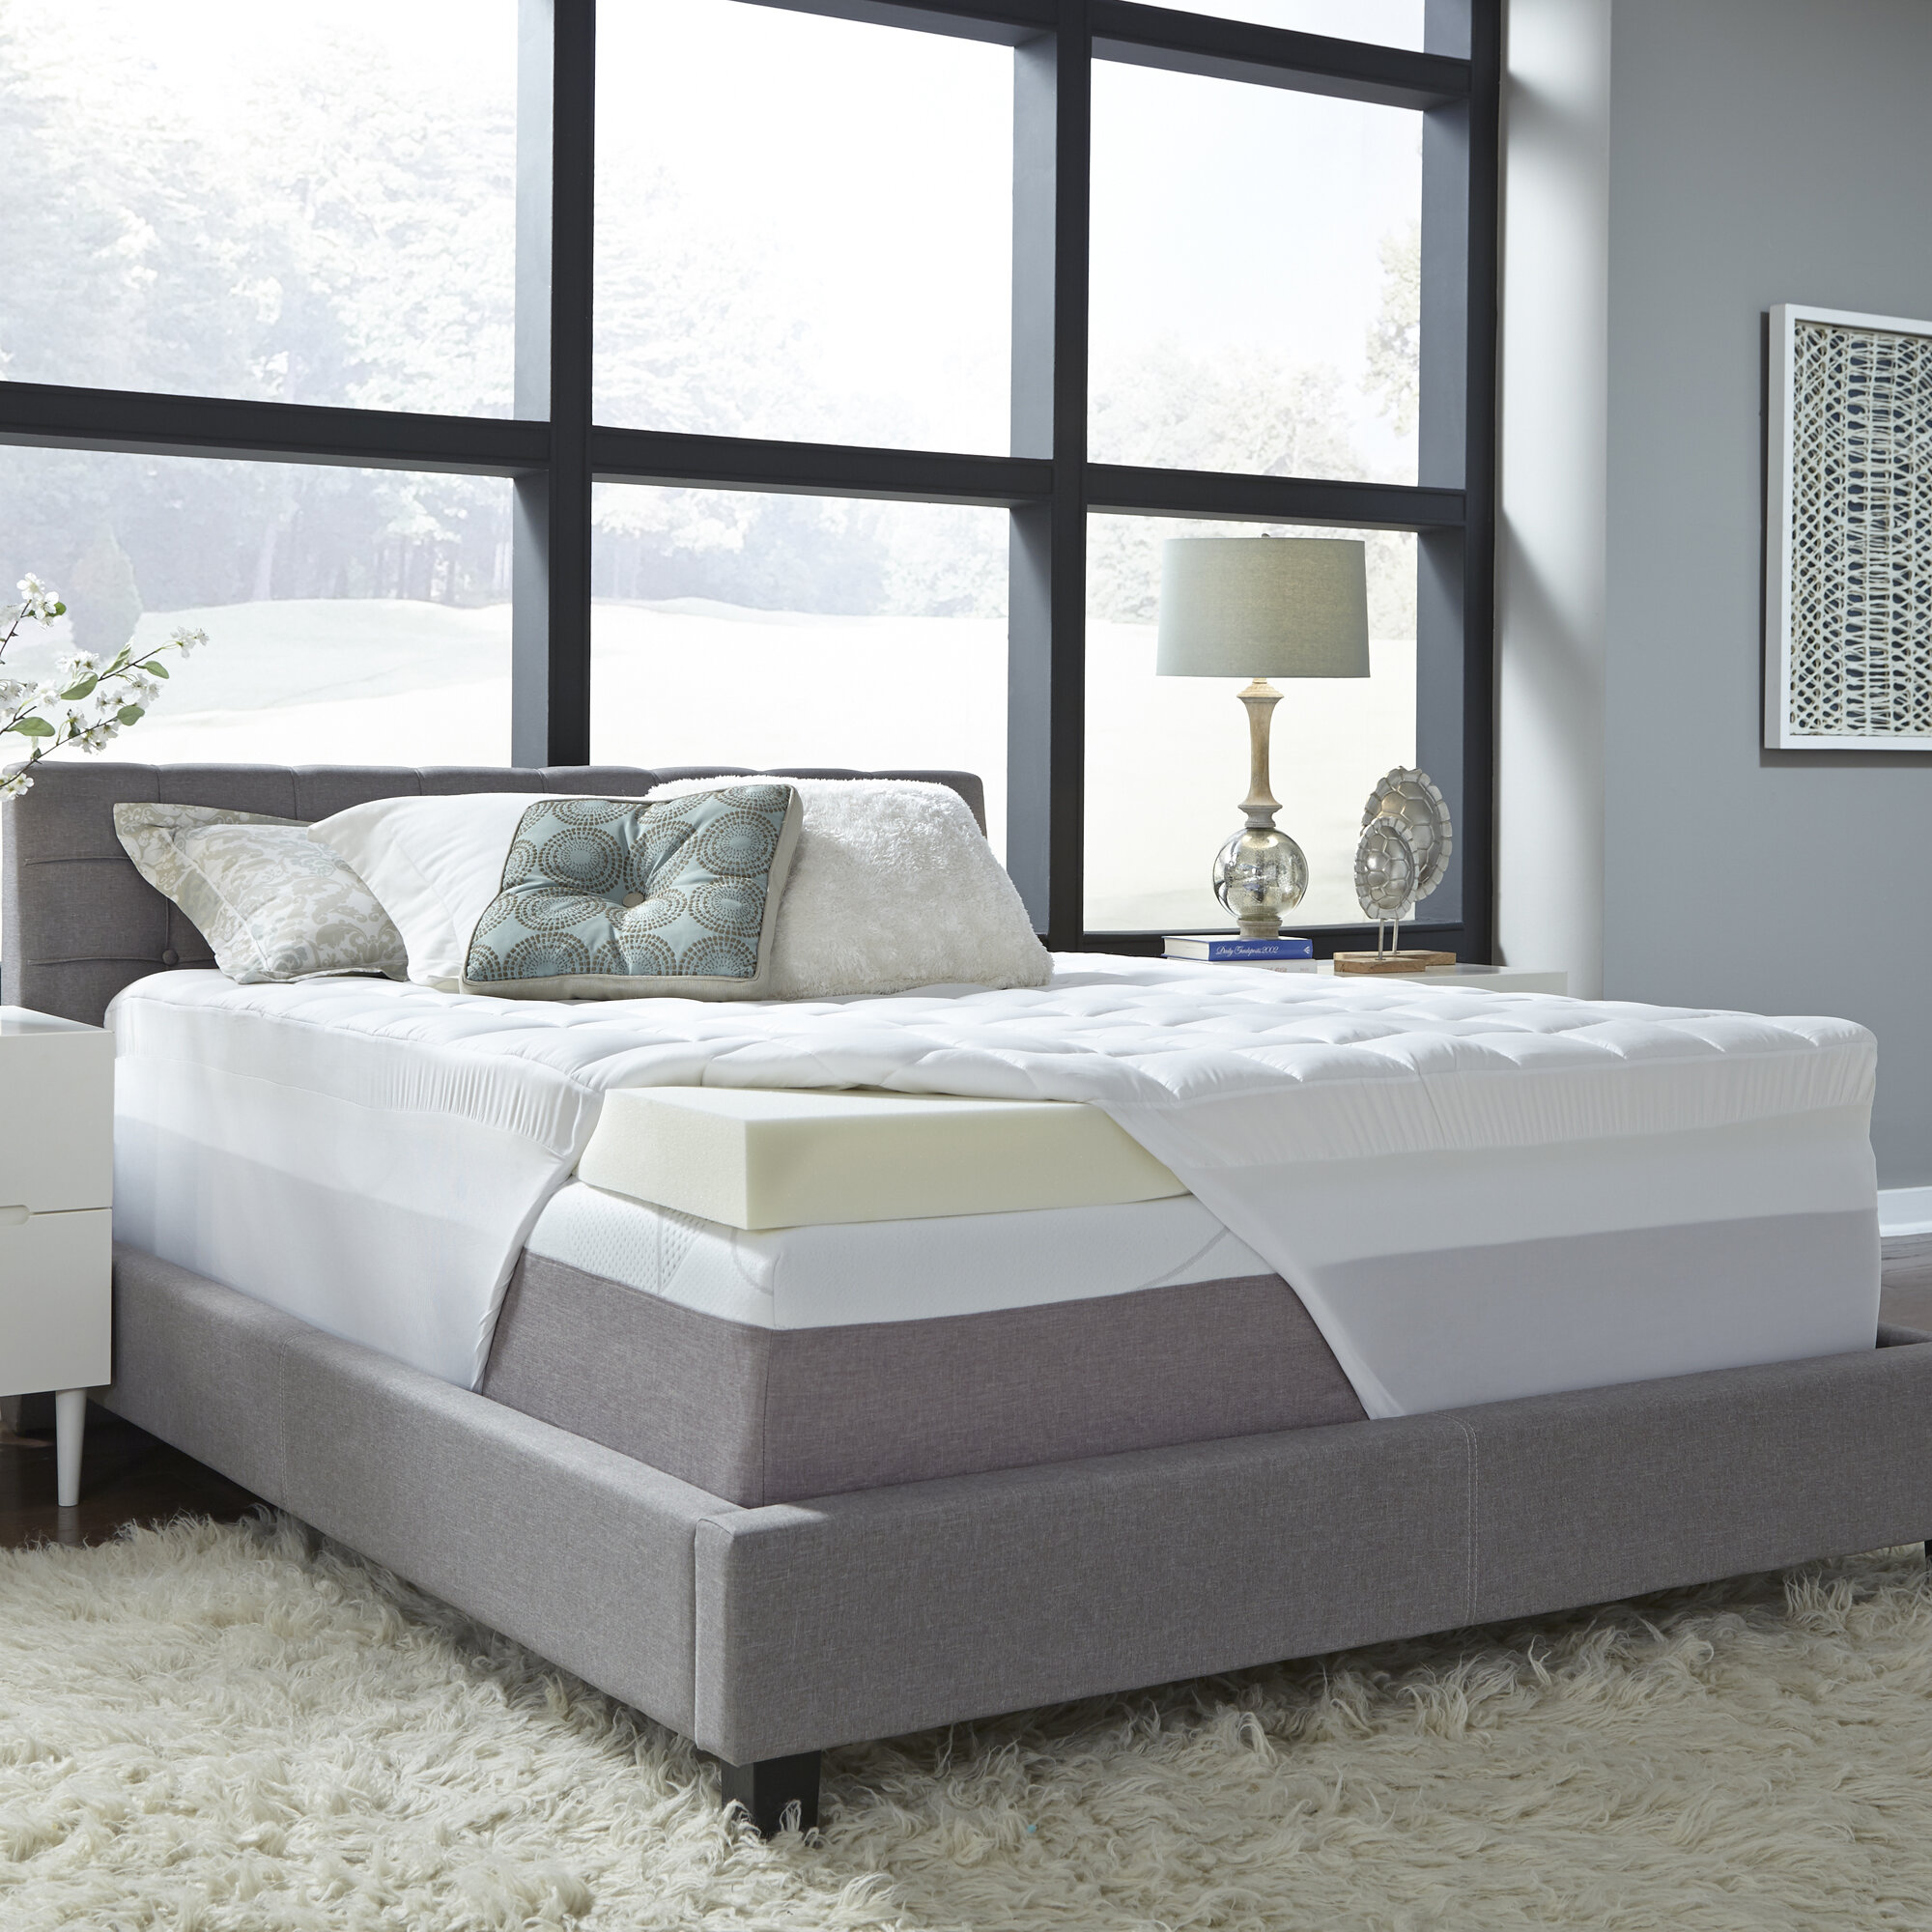 Coprimaterasso Memory Foam 5 Cm.Comforpedic Loft From Beautyrest 5 5 Certipur U S Certified Memory Foam Mattress Topper Reviews Wayfair